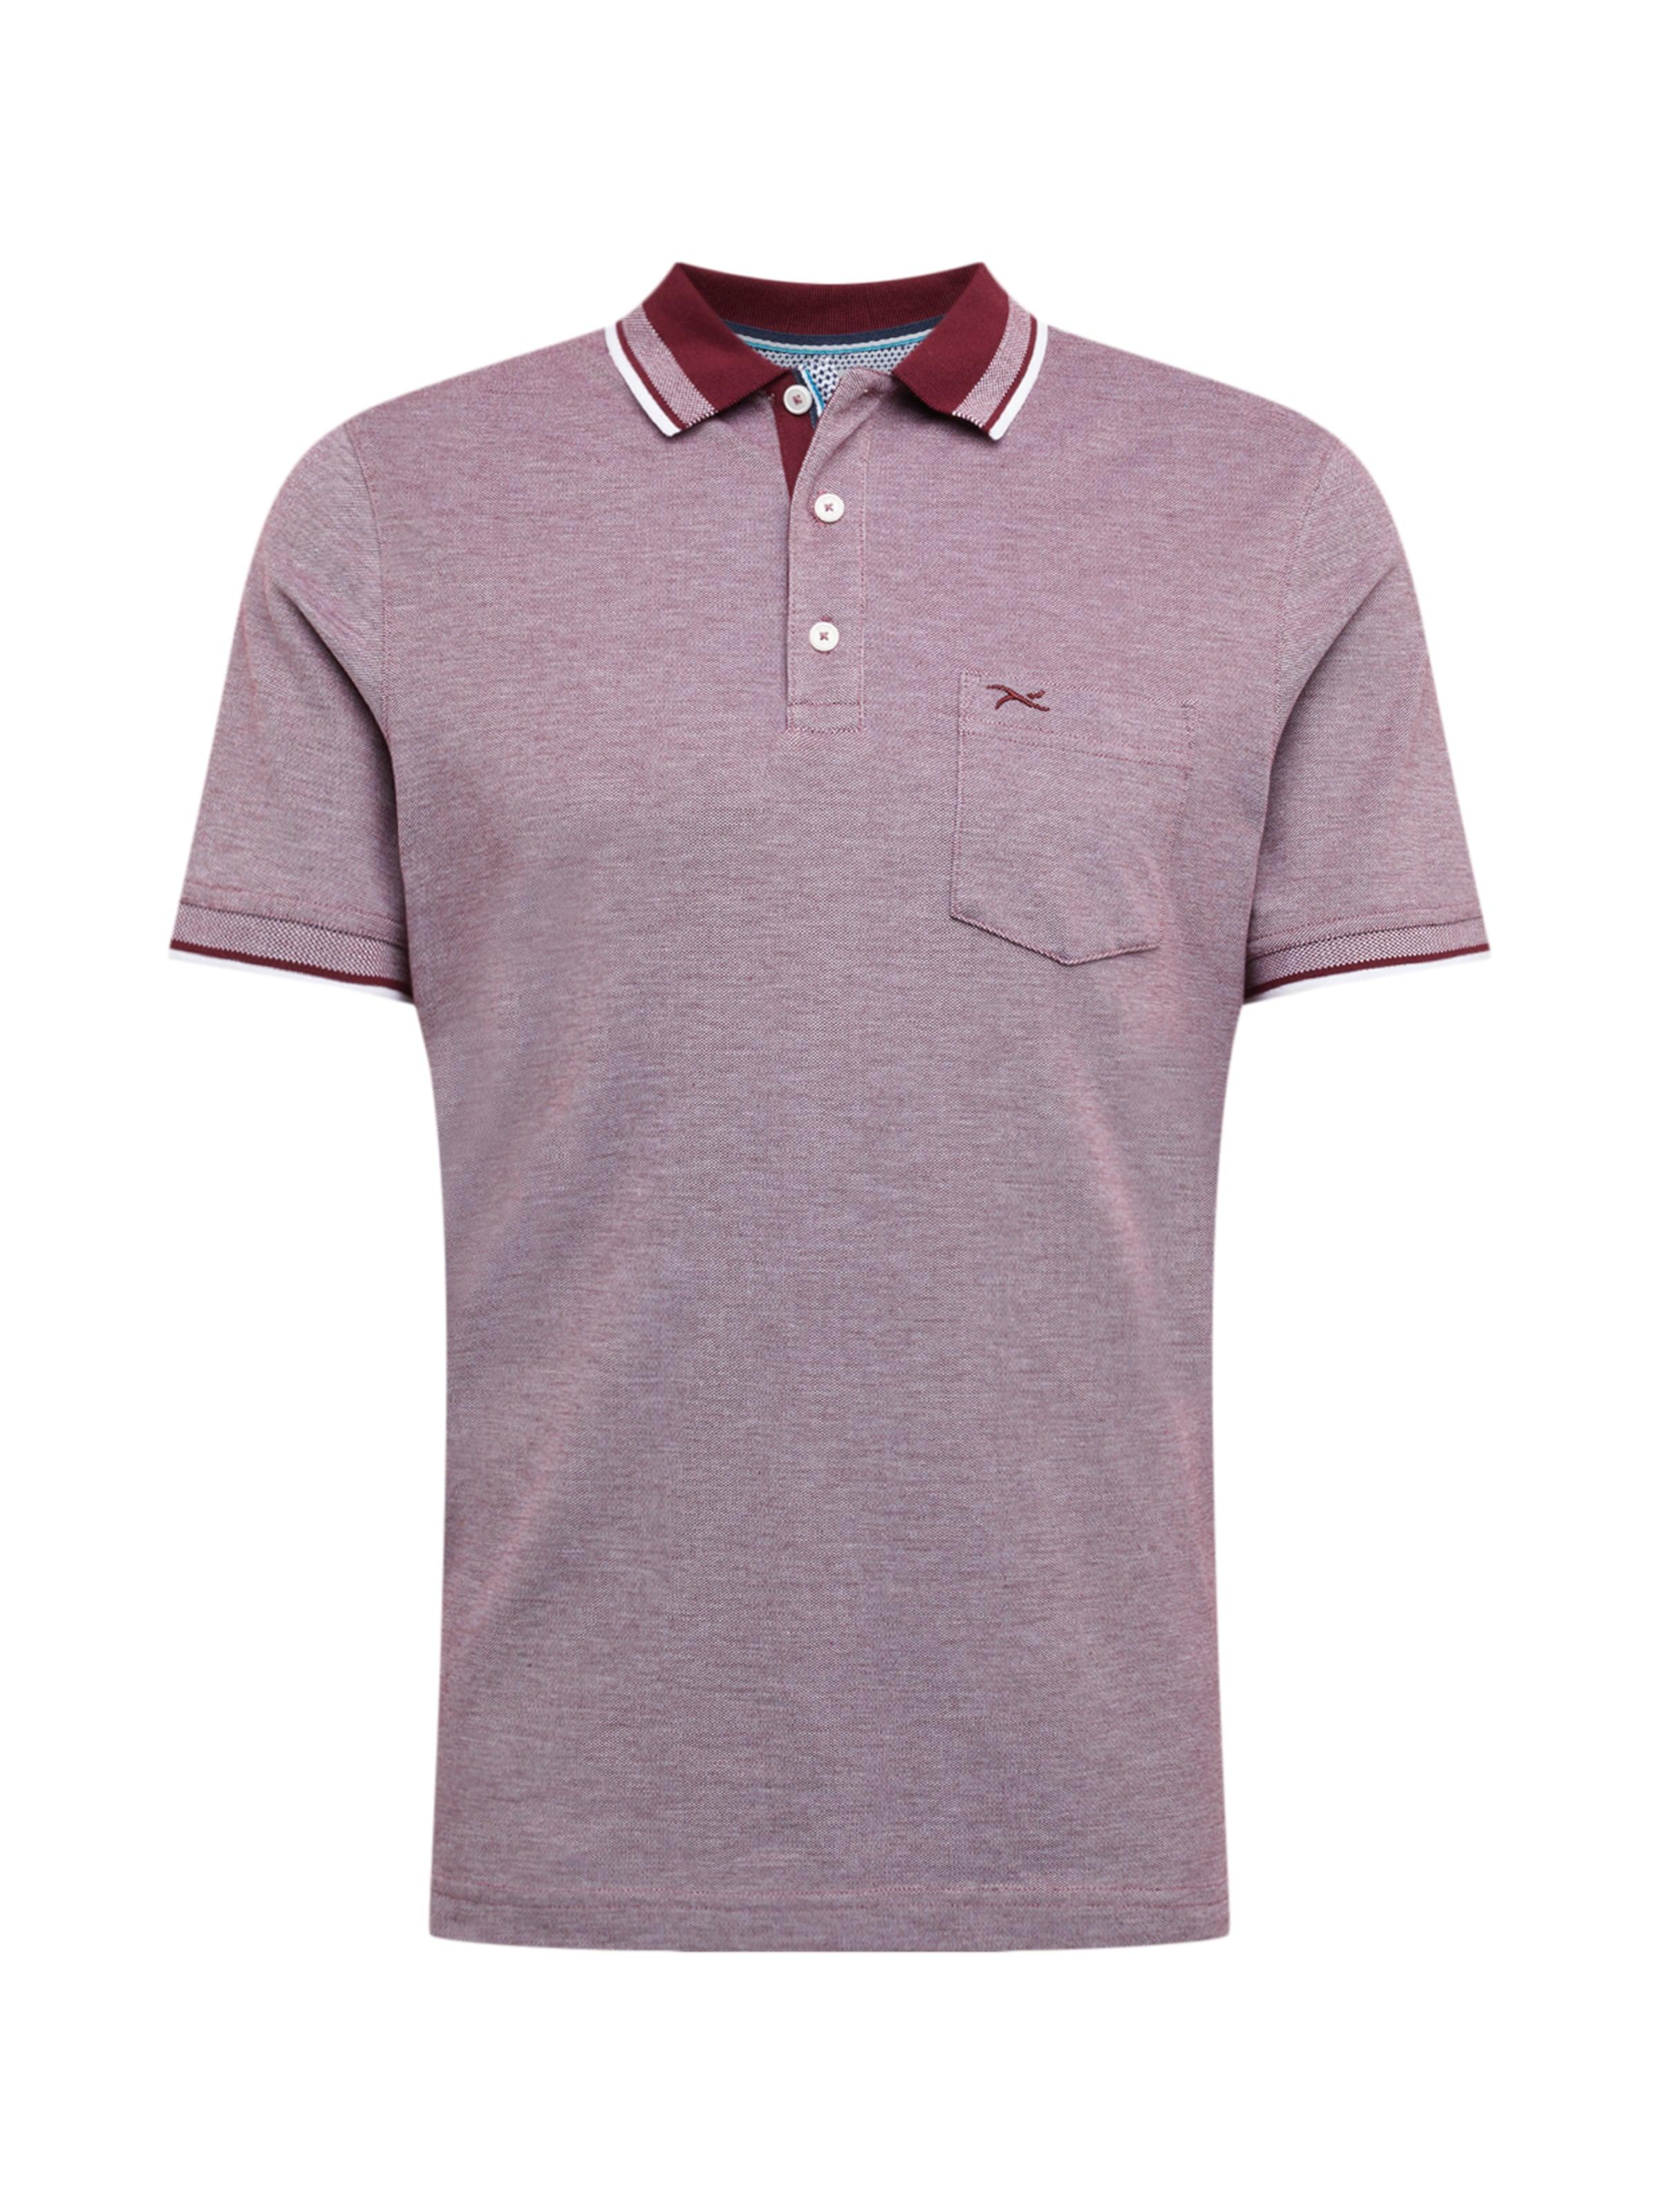 Brax Flieder 'petter' Brax 'petter' Poloshirt Poloshirt In LAj34R5